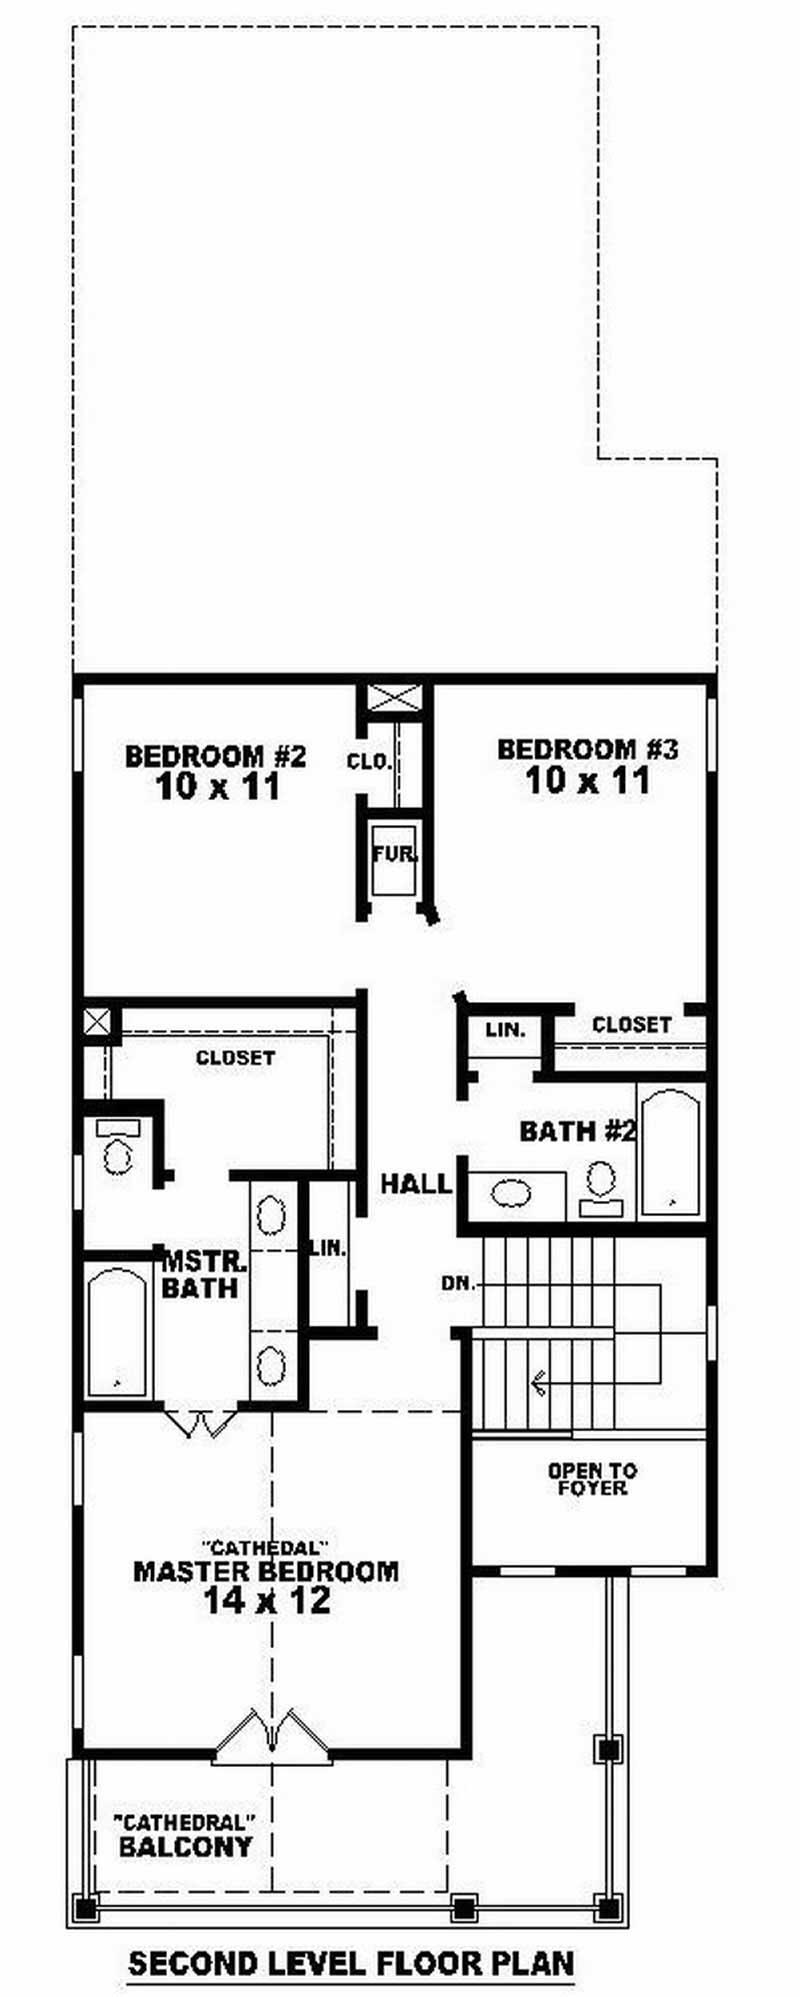 House Plan 170 2880 3 Bedroom 1670 Sq Ft Coastal